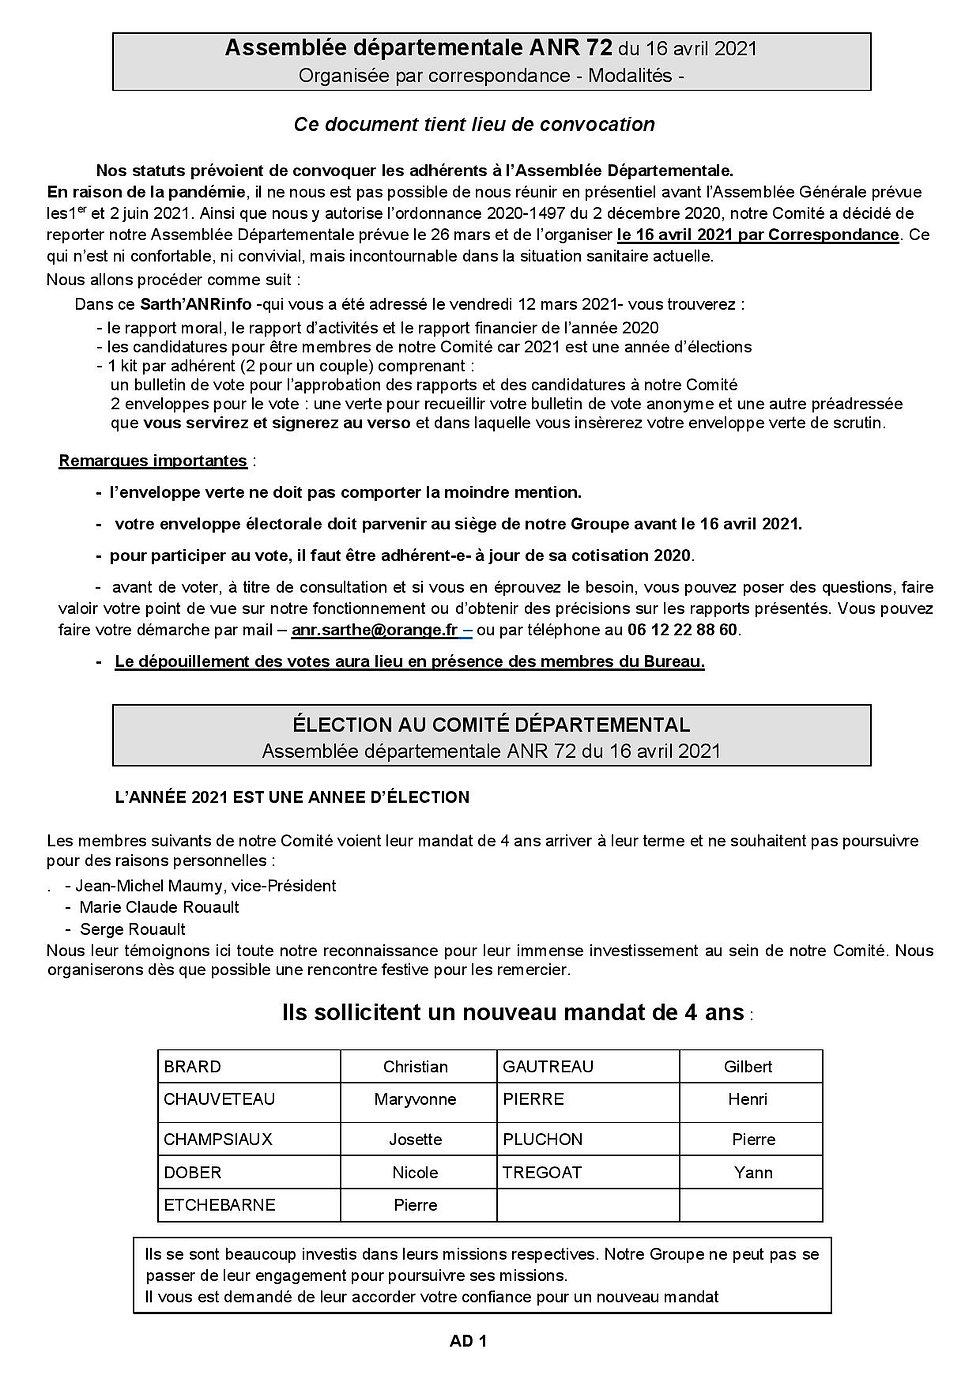 9 ANR 72  AD 16-04-2021    Organisation-